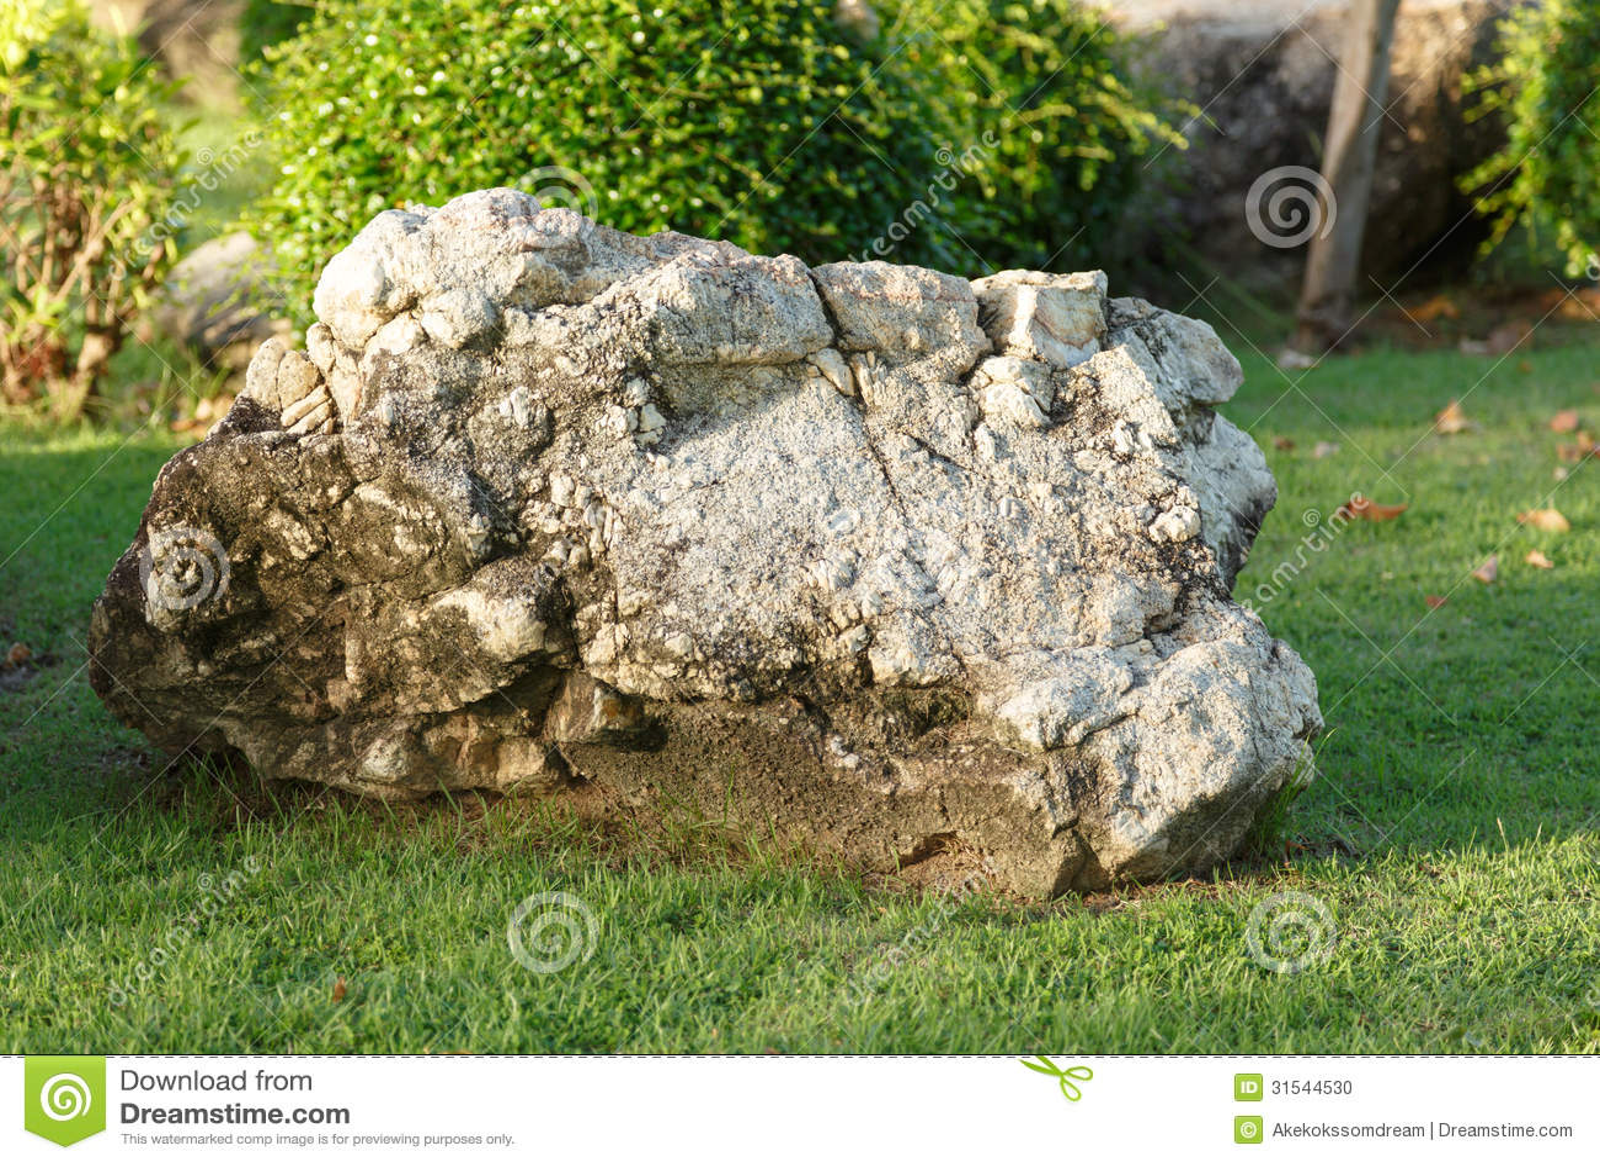 Big Rocks And Stones~ Pedras Grandes Jardim